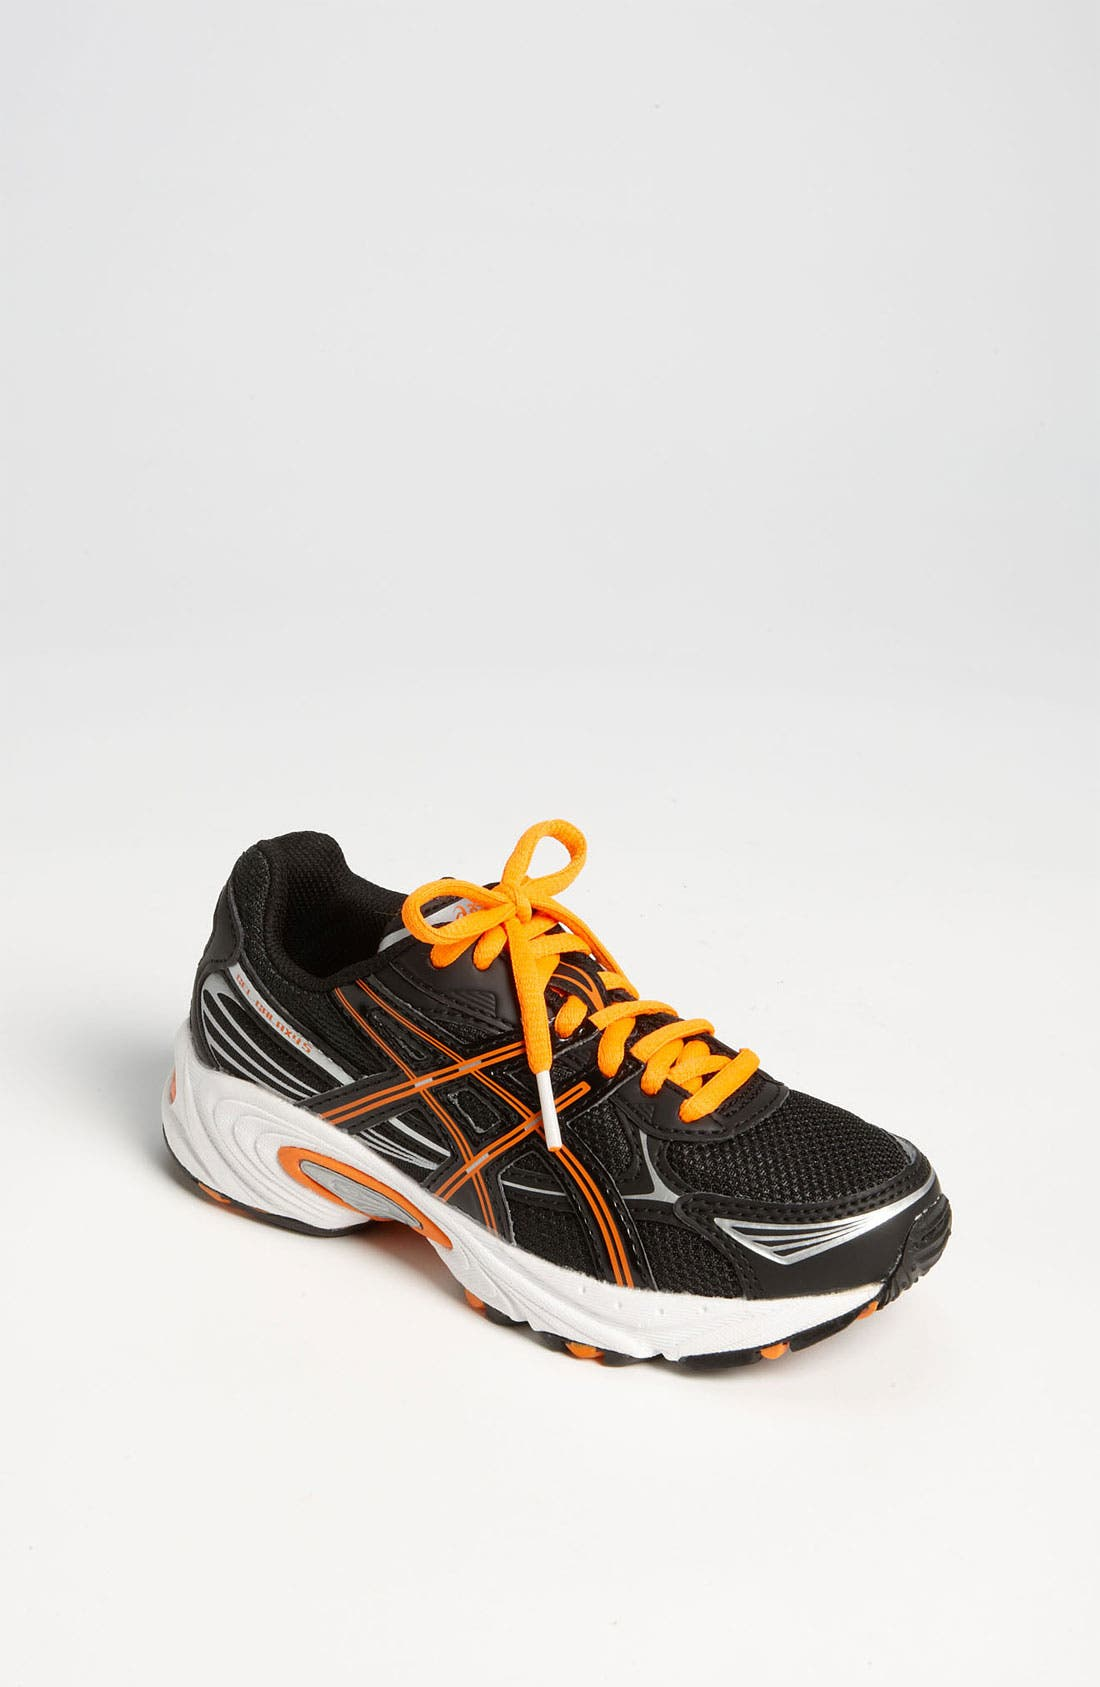 Main Image - ASICS® 'GEL®-Galaxy 5' Running Shoe (Little Kid & Big Kid)